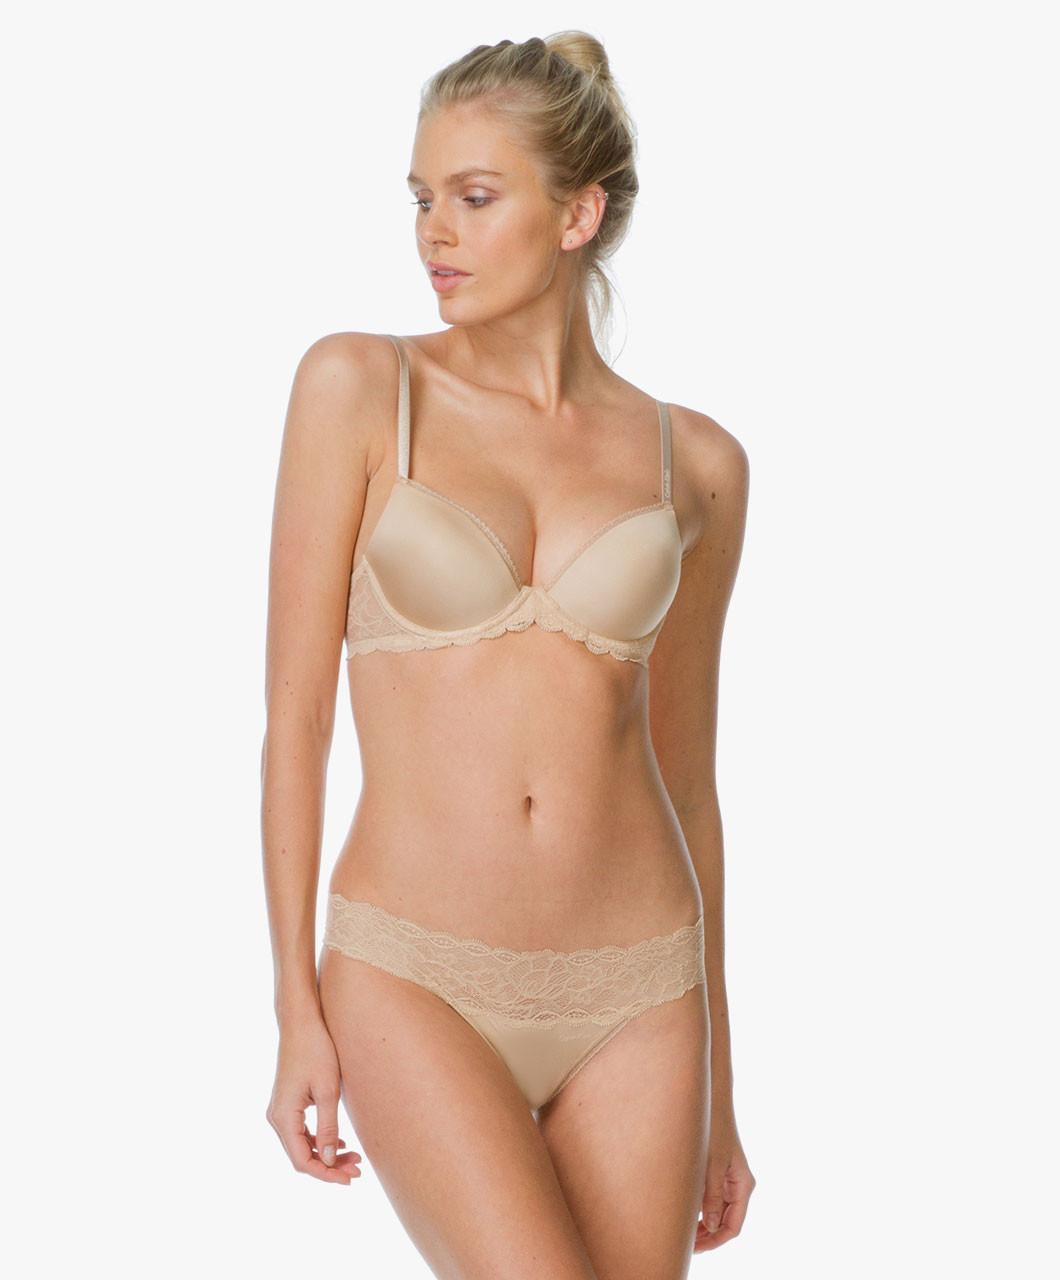 Kalhotky Seductive Comfort Lace F1199E - Calvin Klein Barva: hnědá, Velikost: M